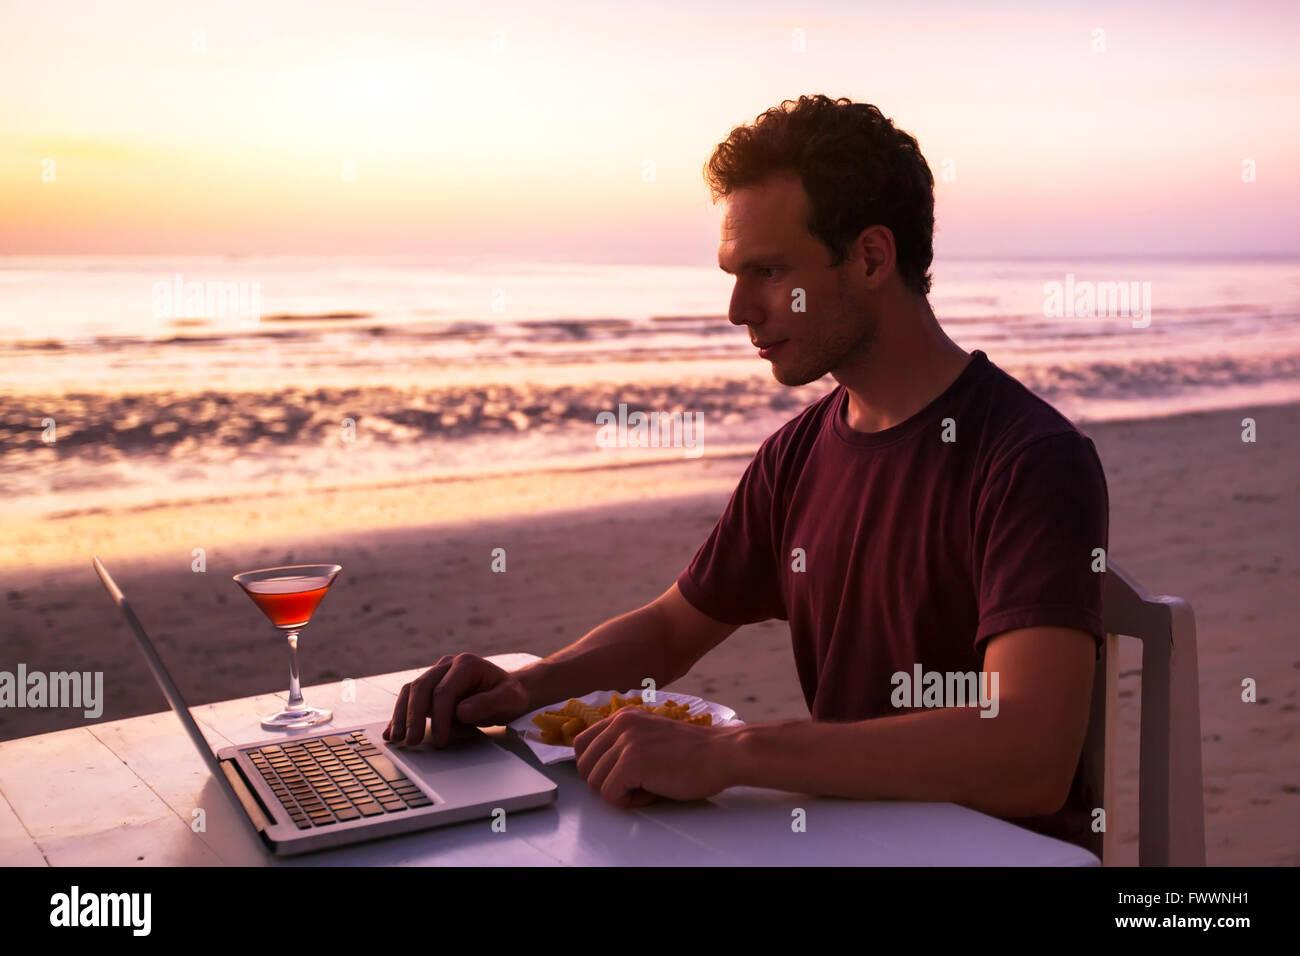 Mann mit Laptop im Restaurant am Strand bei Sonnenuntergang Stockbild